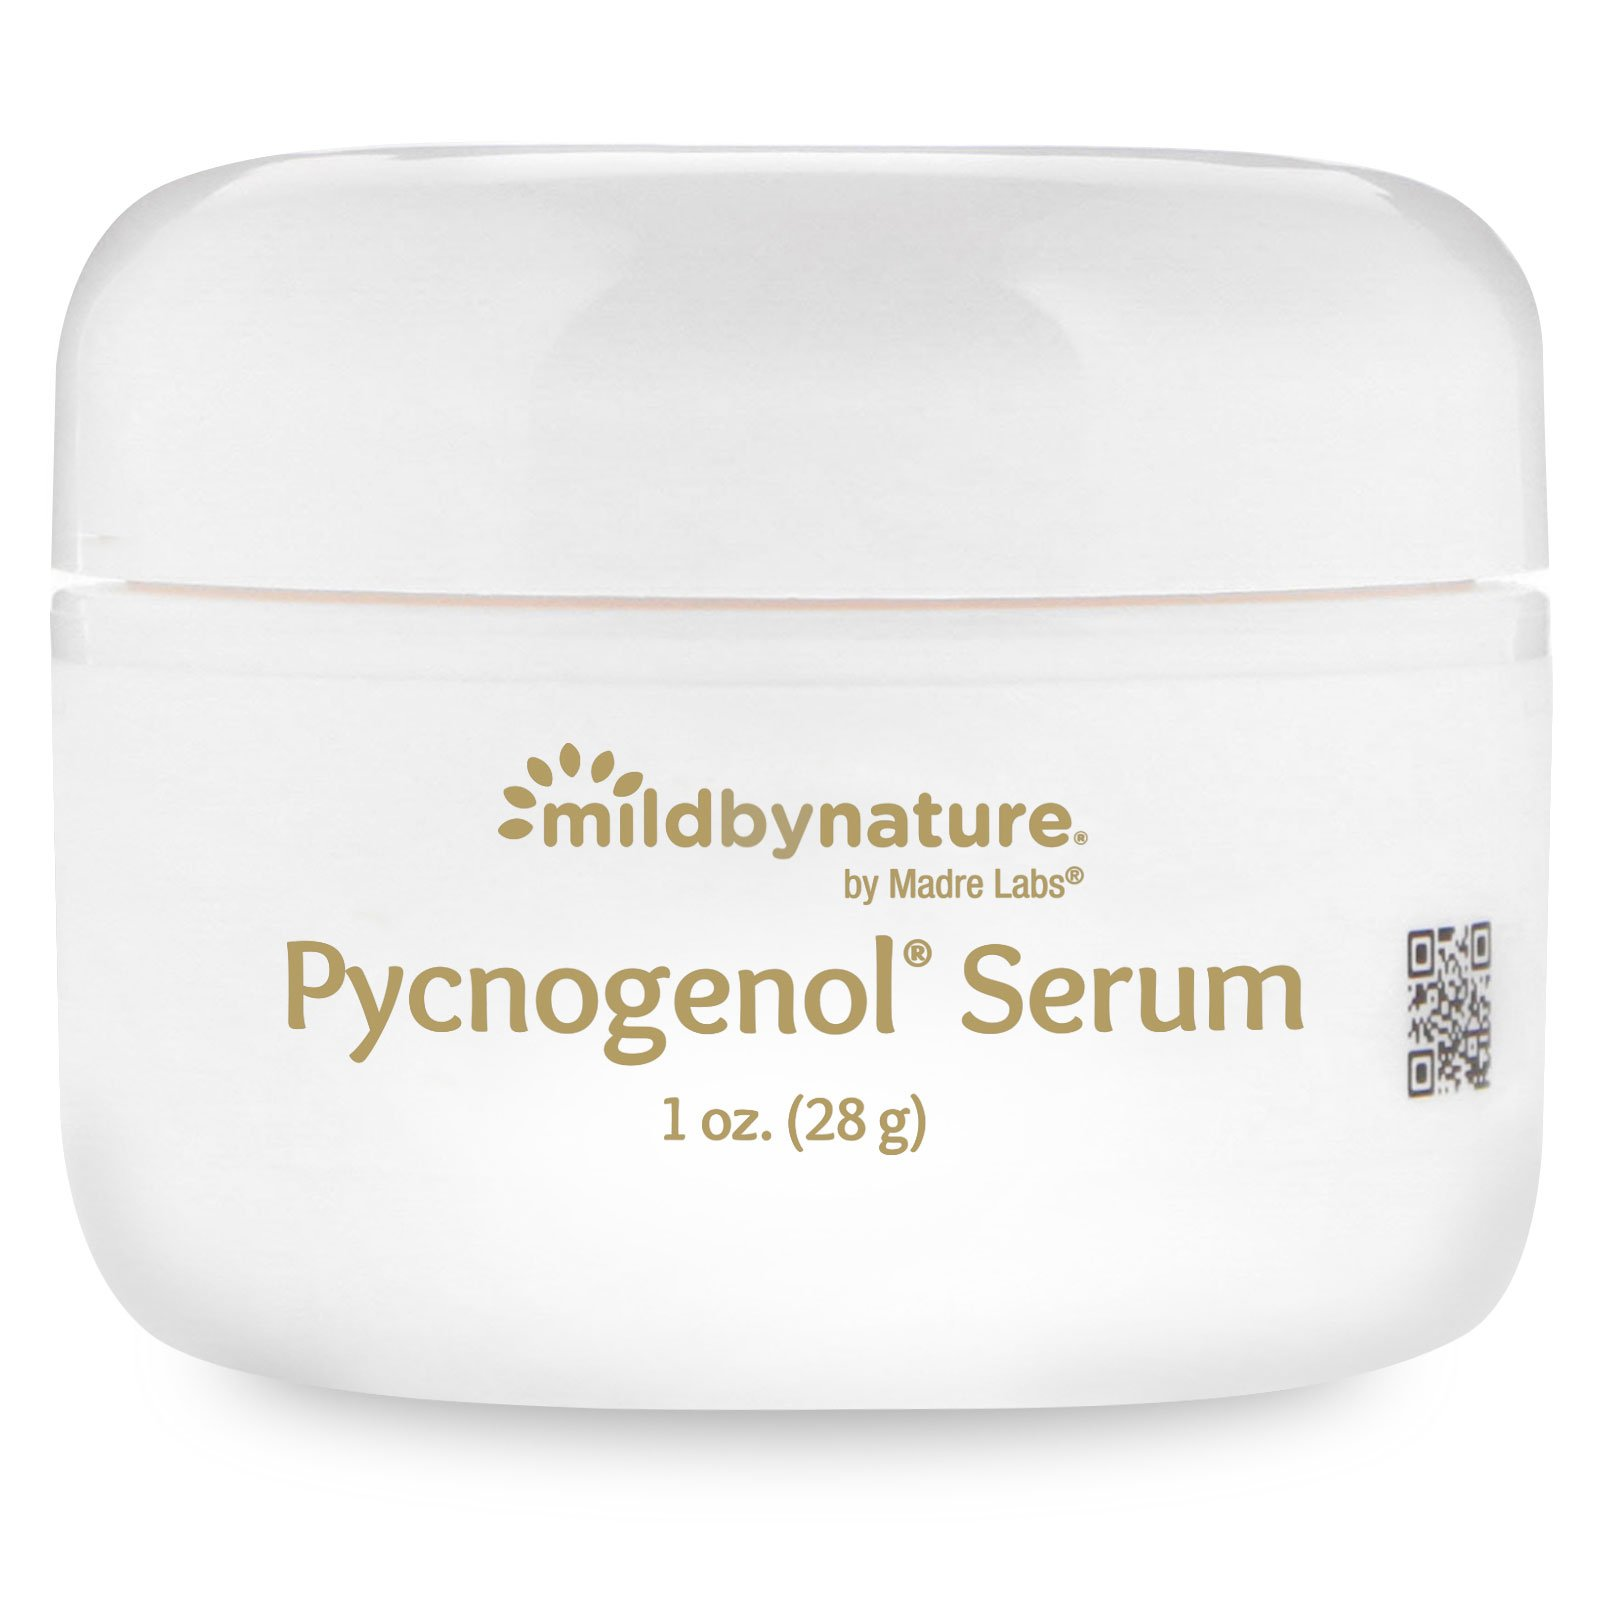 Mild By Nature Pycnogenol Serum Cream Soothing And Anti Aging 1